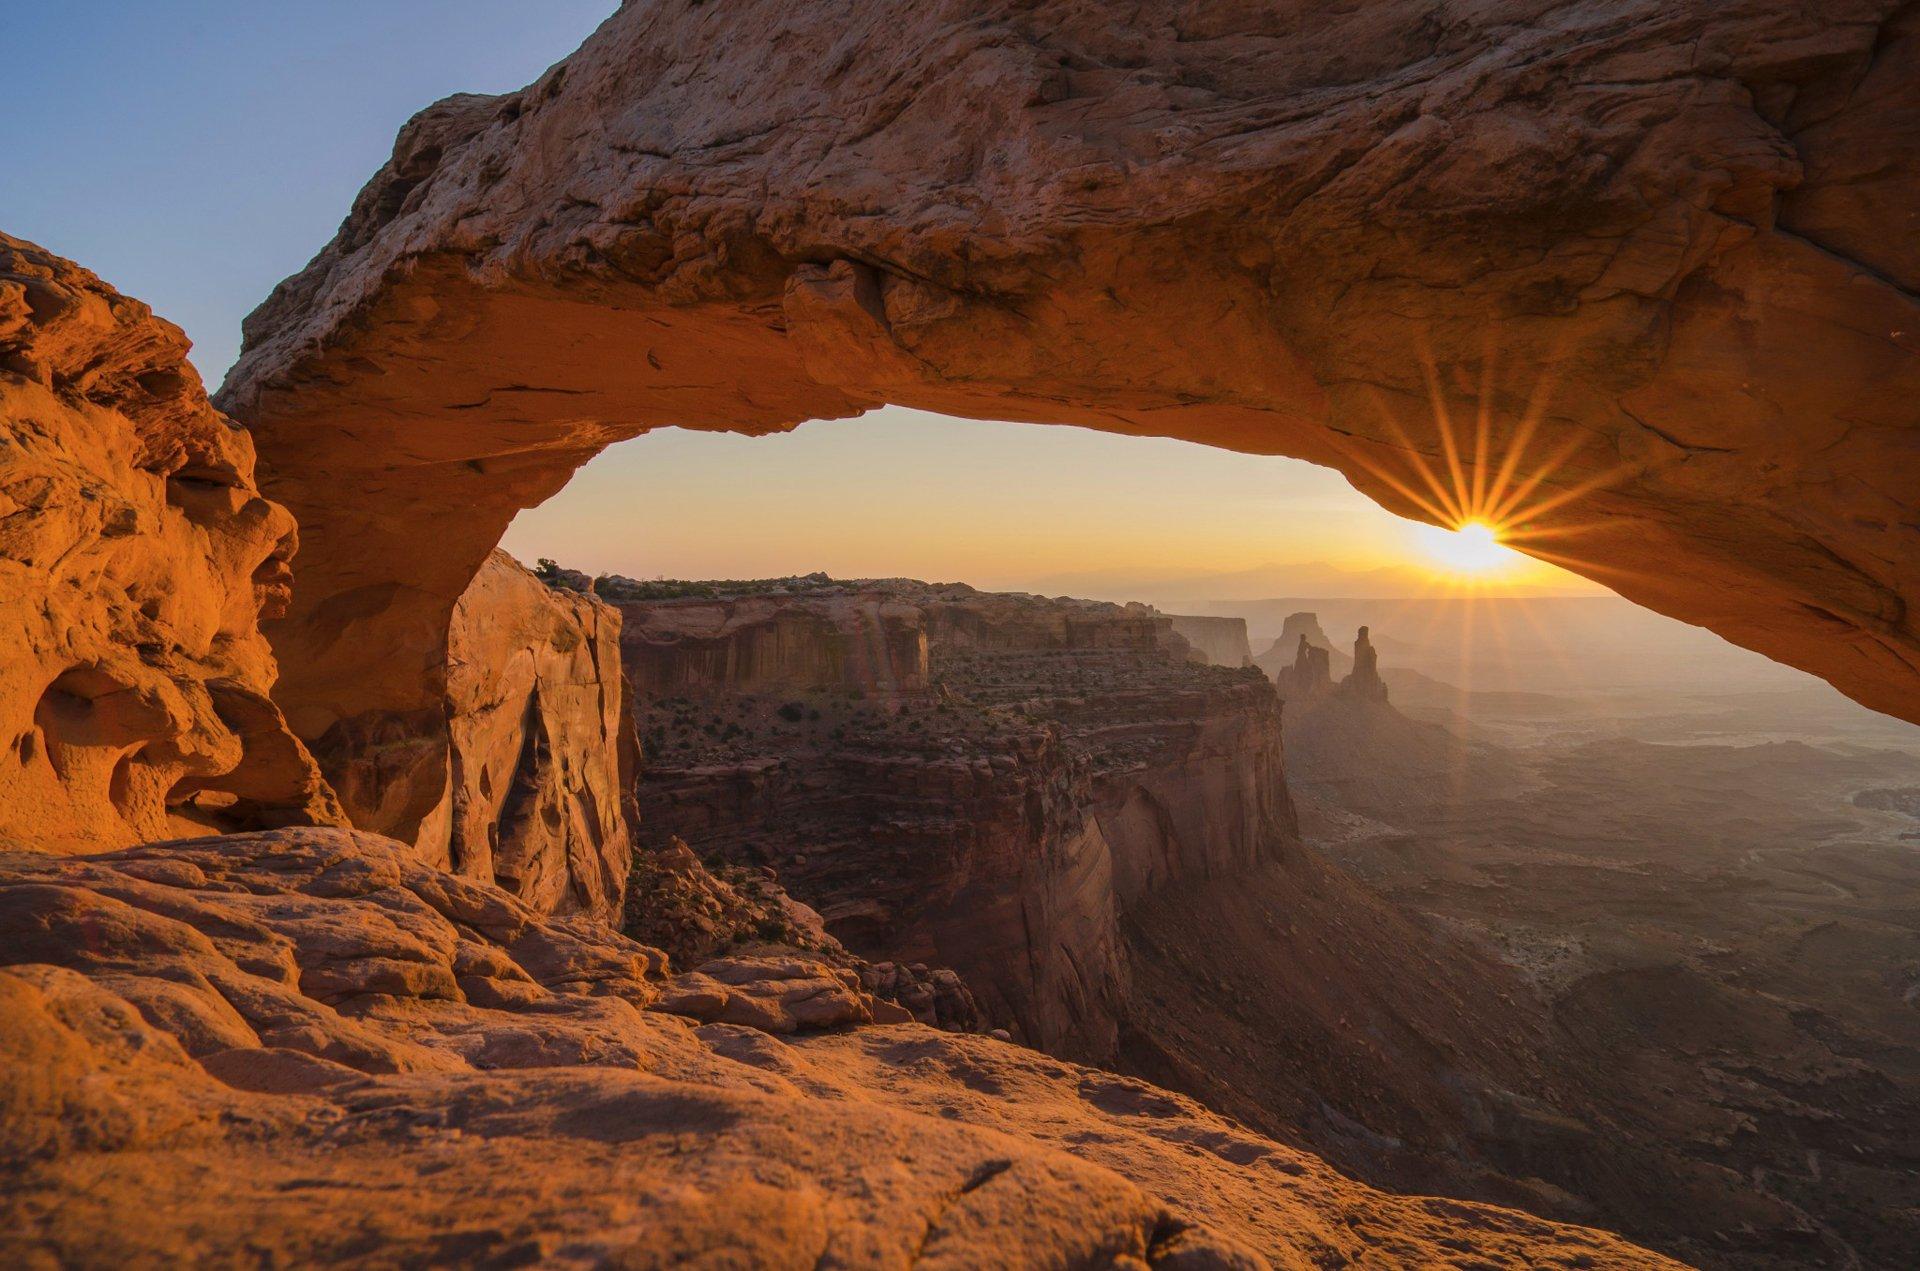 лучи арка гора скала бесплатно